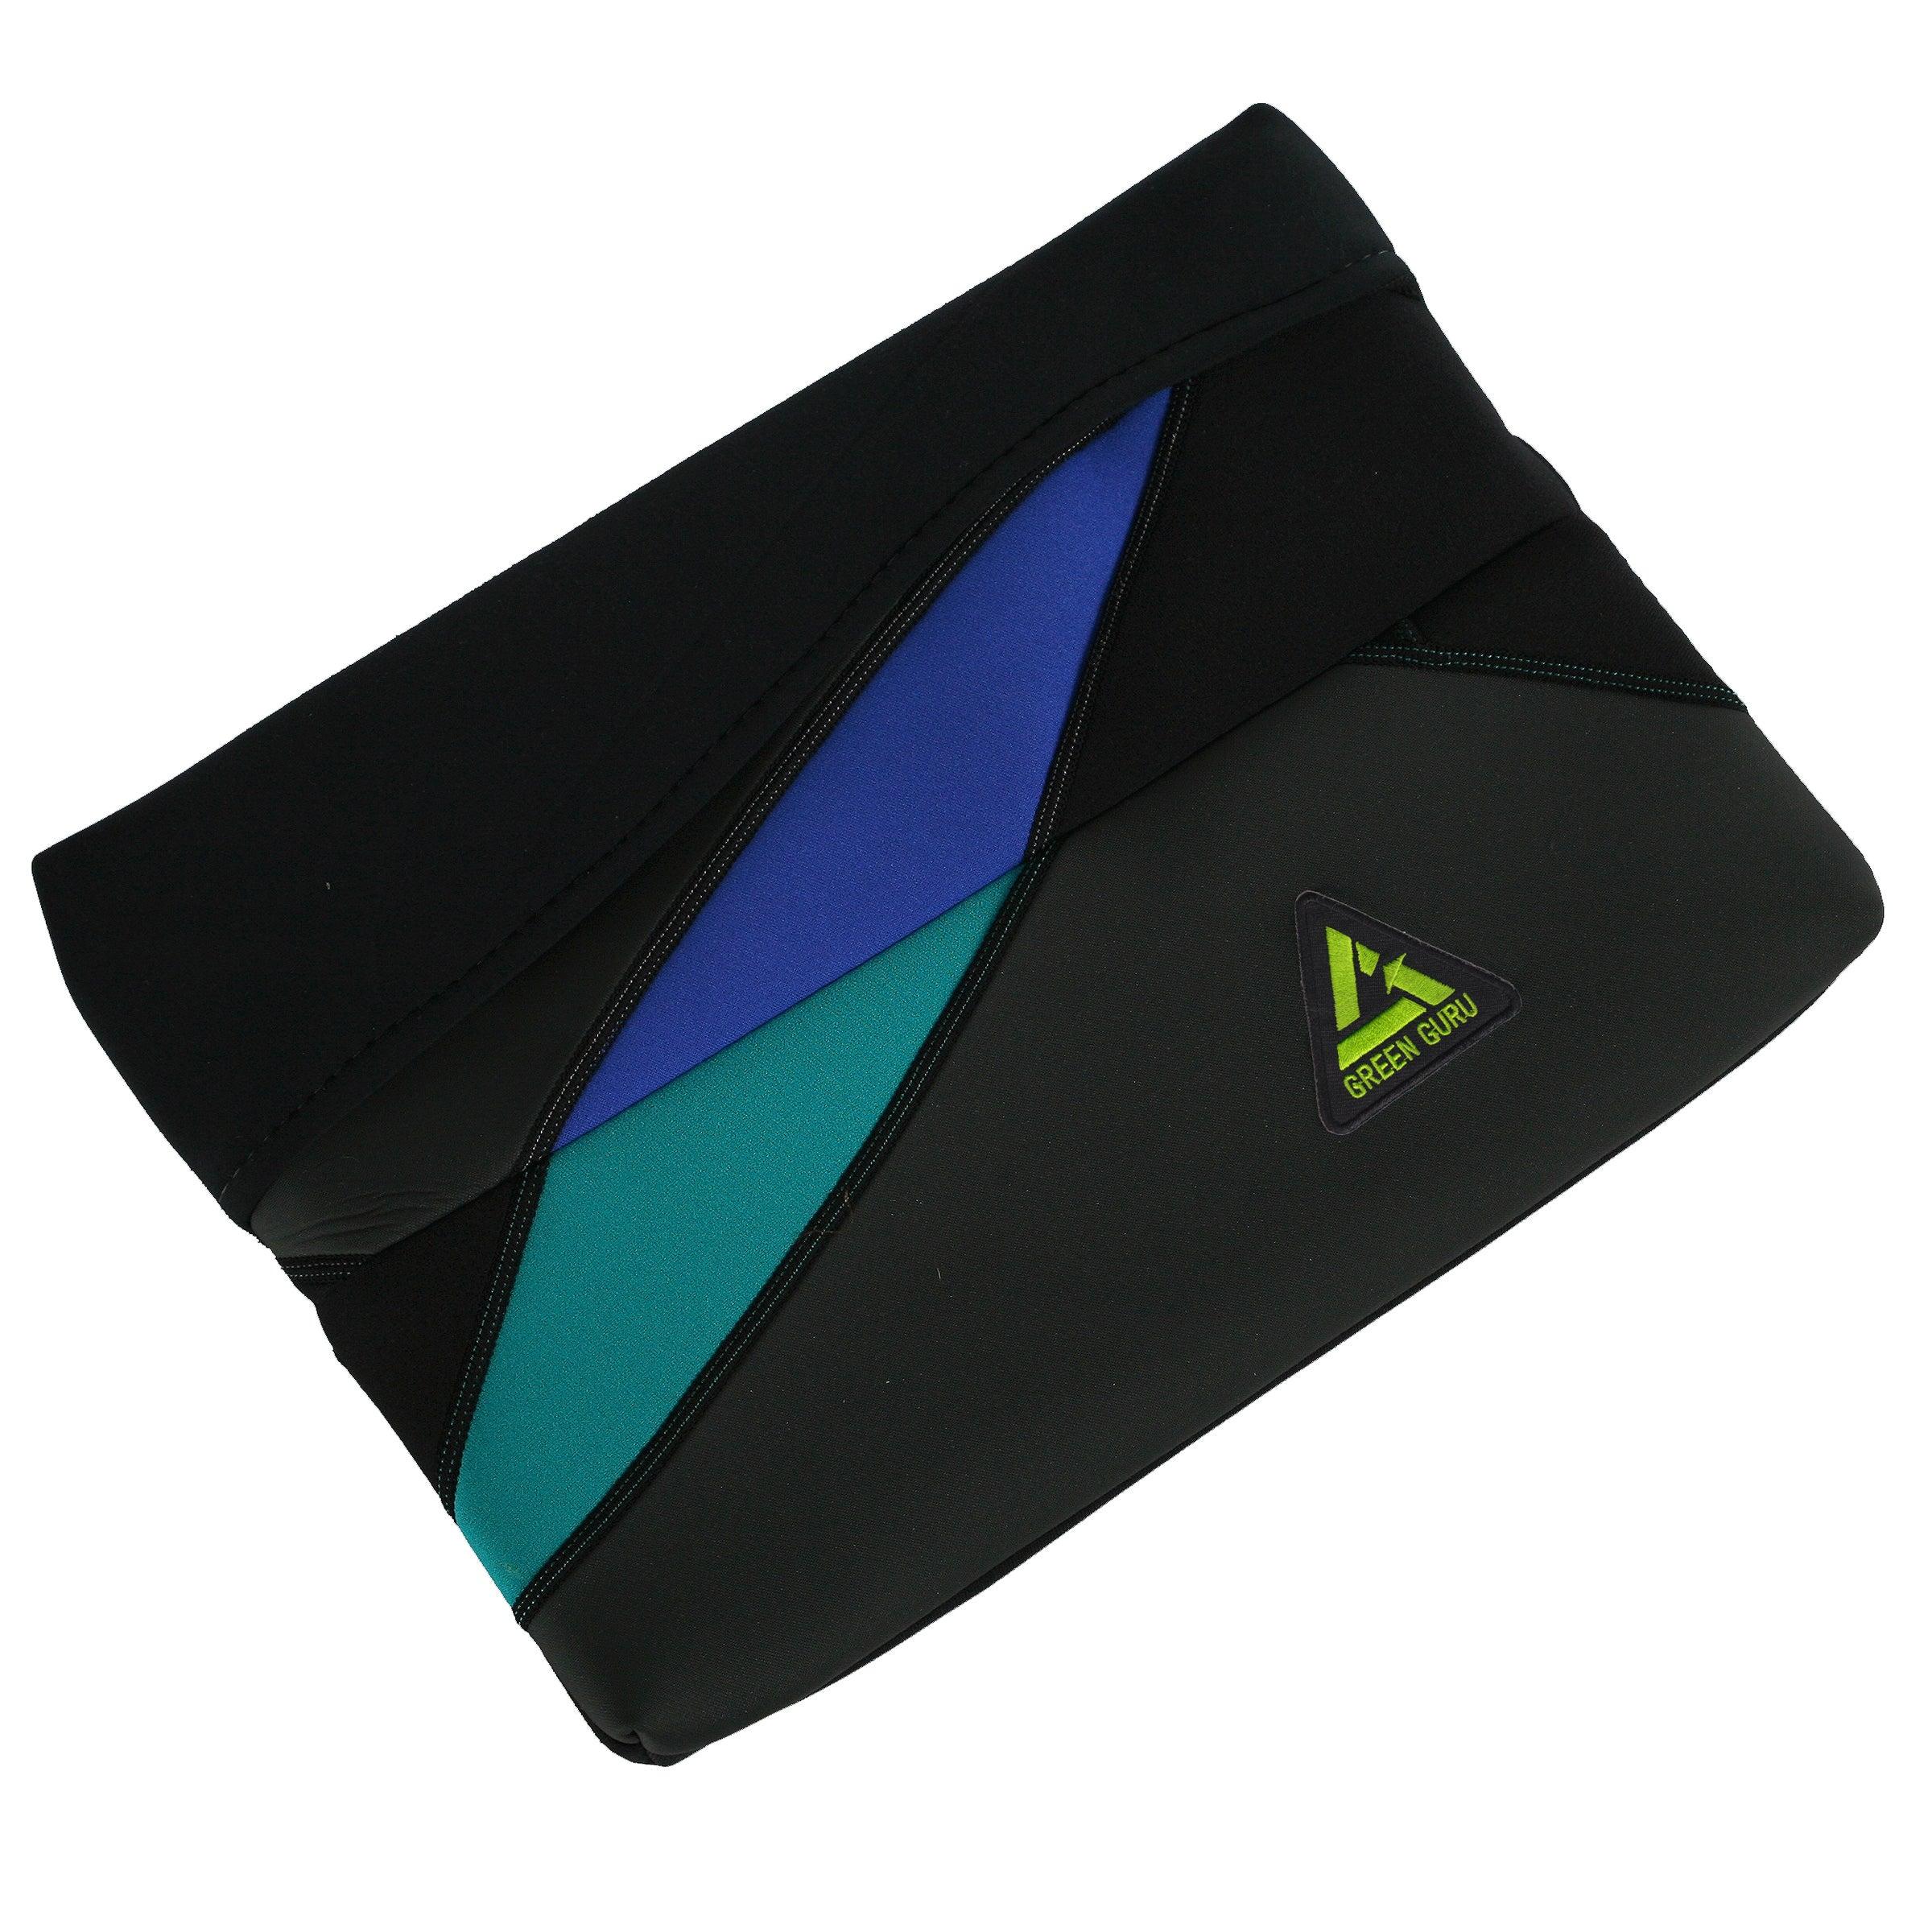 Green Guru Black/Blue/Green Recycled 15-inch Protective Laptop Sleeve